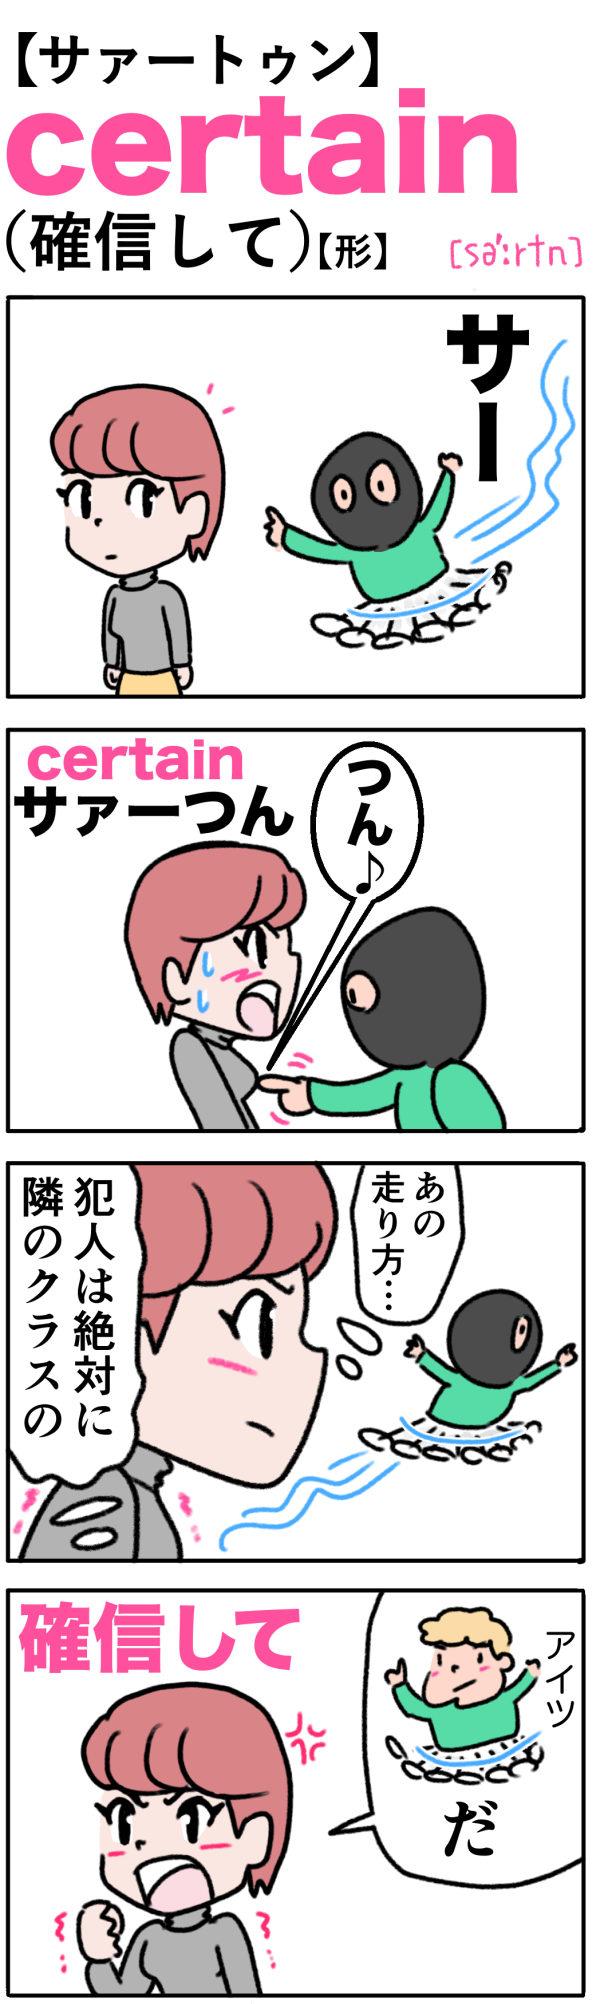 certain(確信して)の語呂合わせ英単語